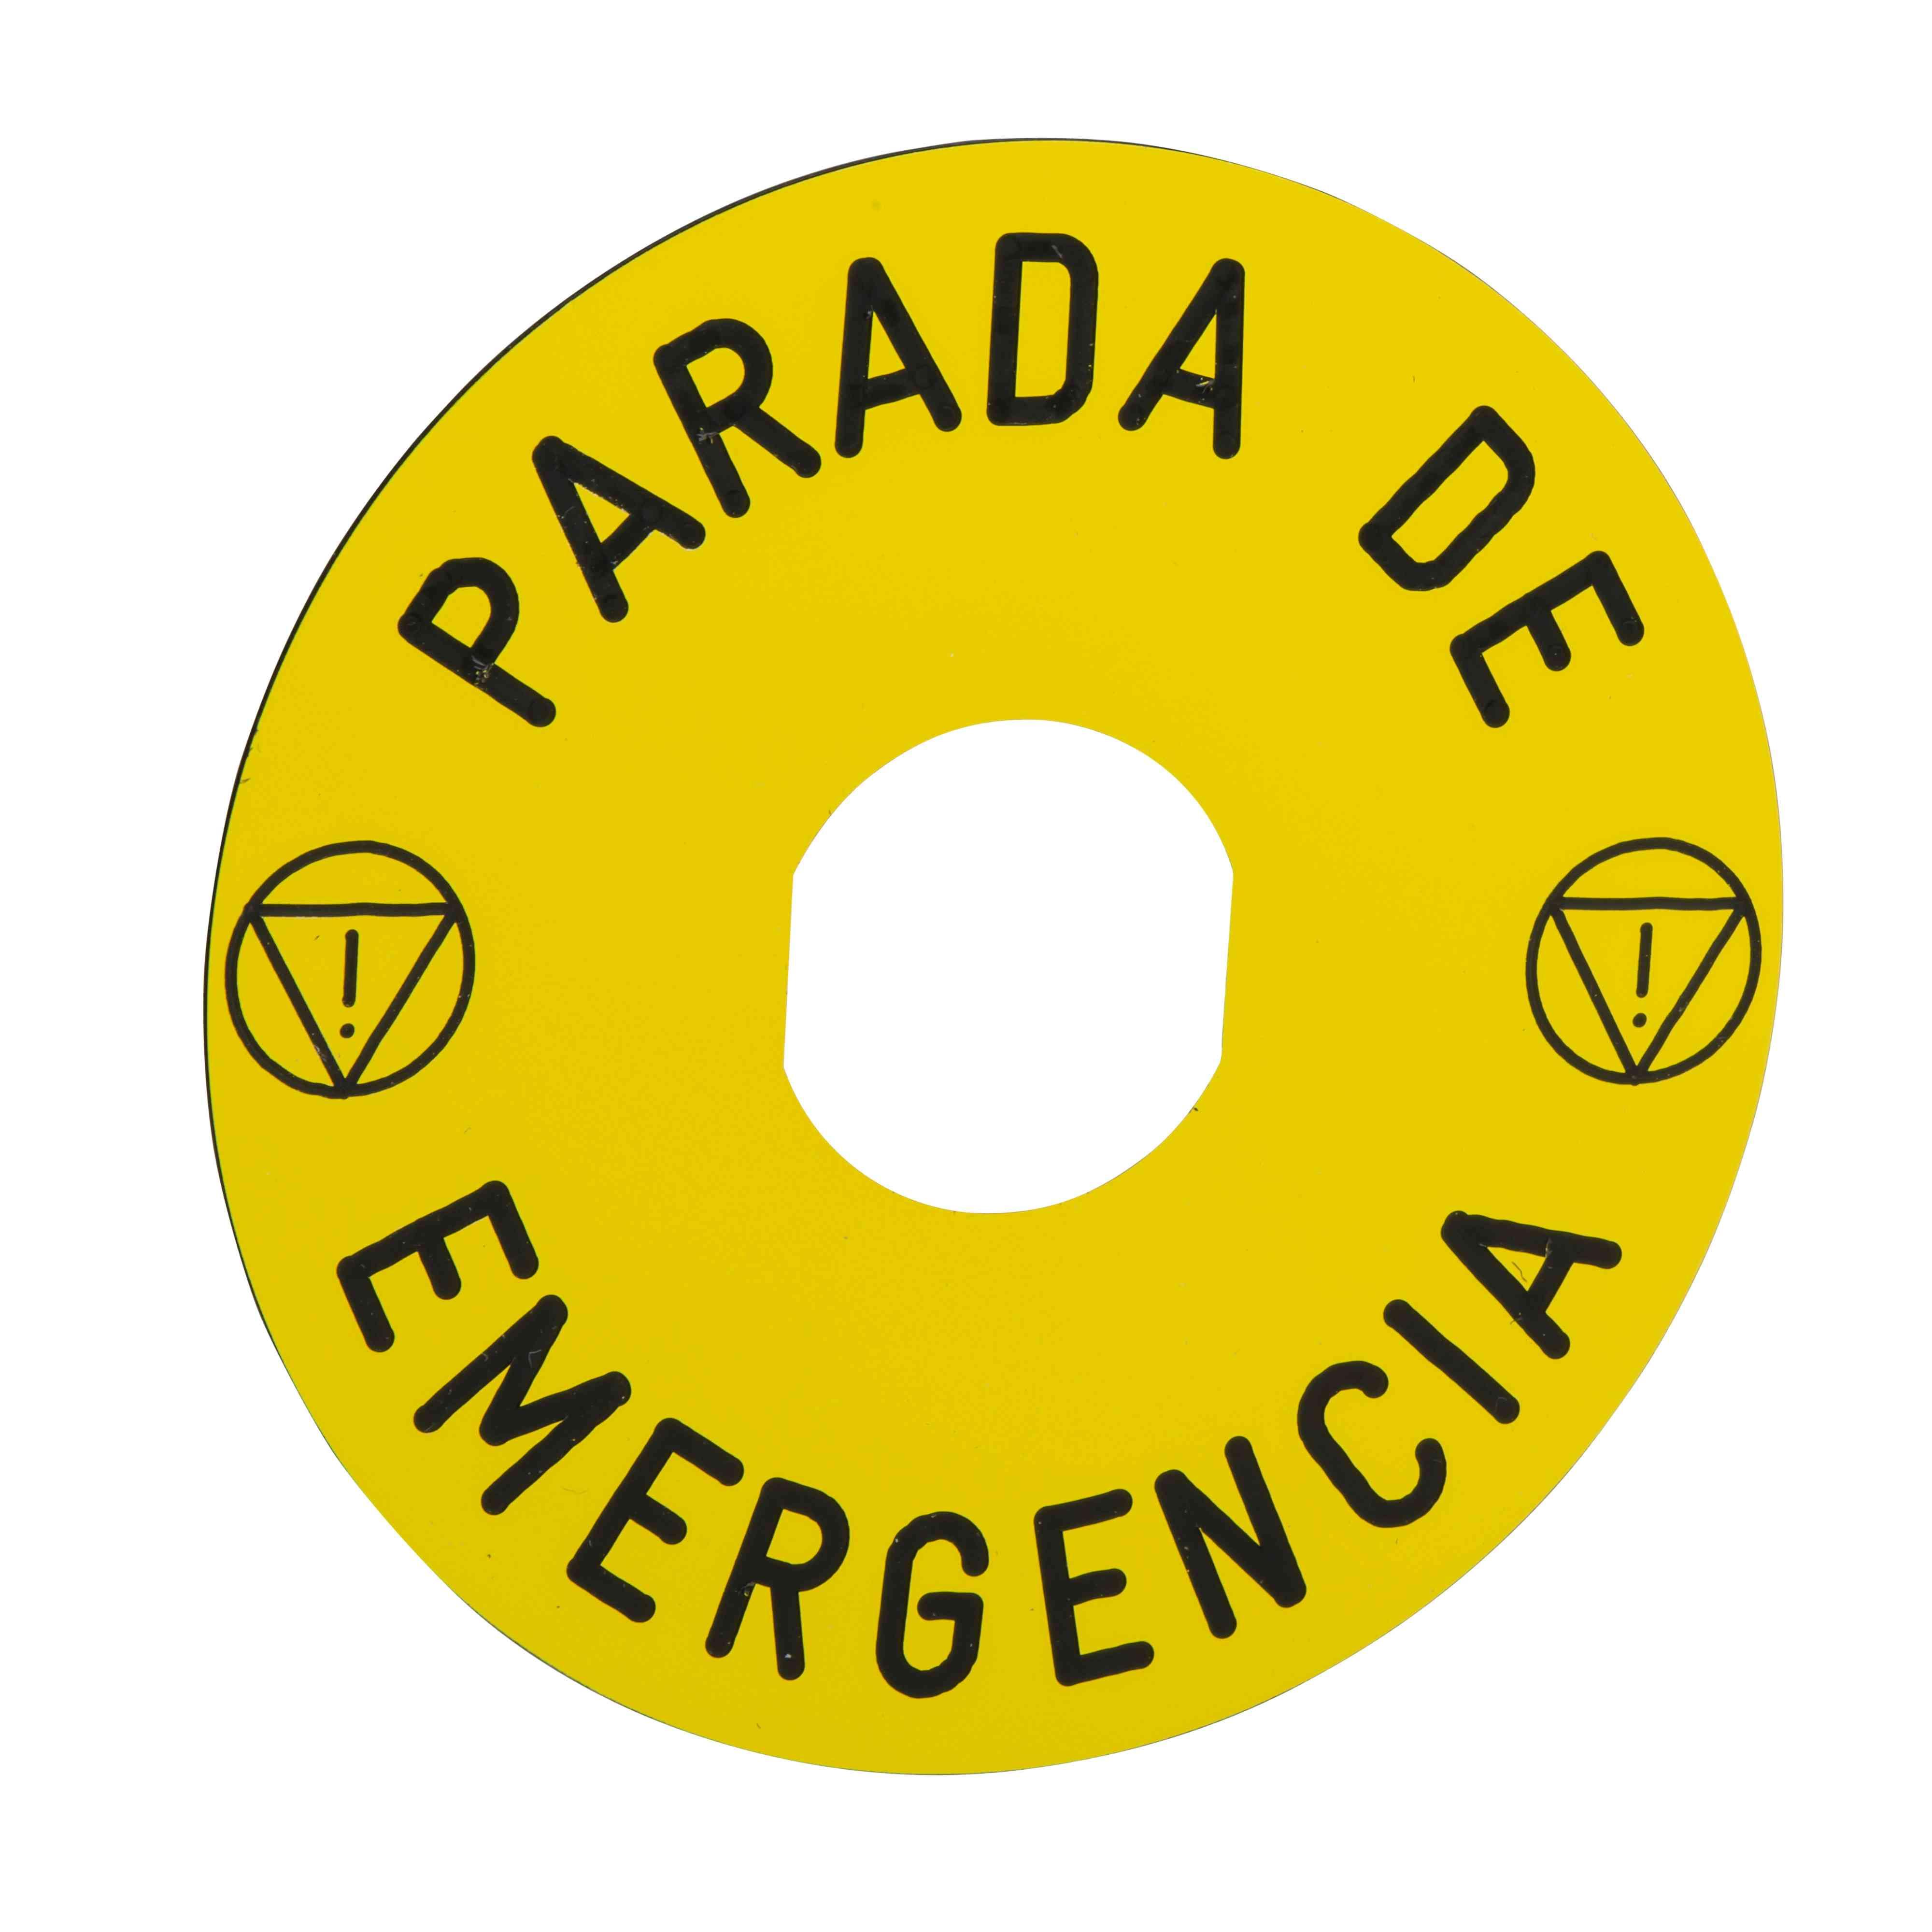 Označena legenda Ø 90 za izklop v sili - PARADA DE EMERGENCIA/logo ISO13850